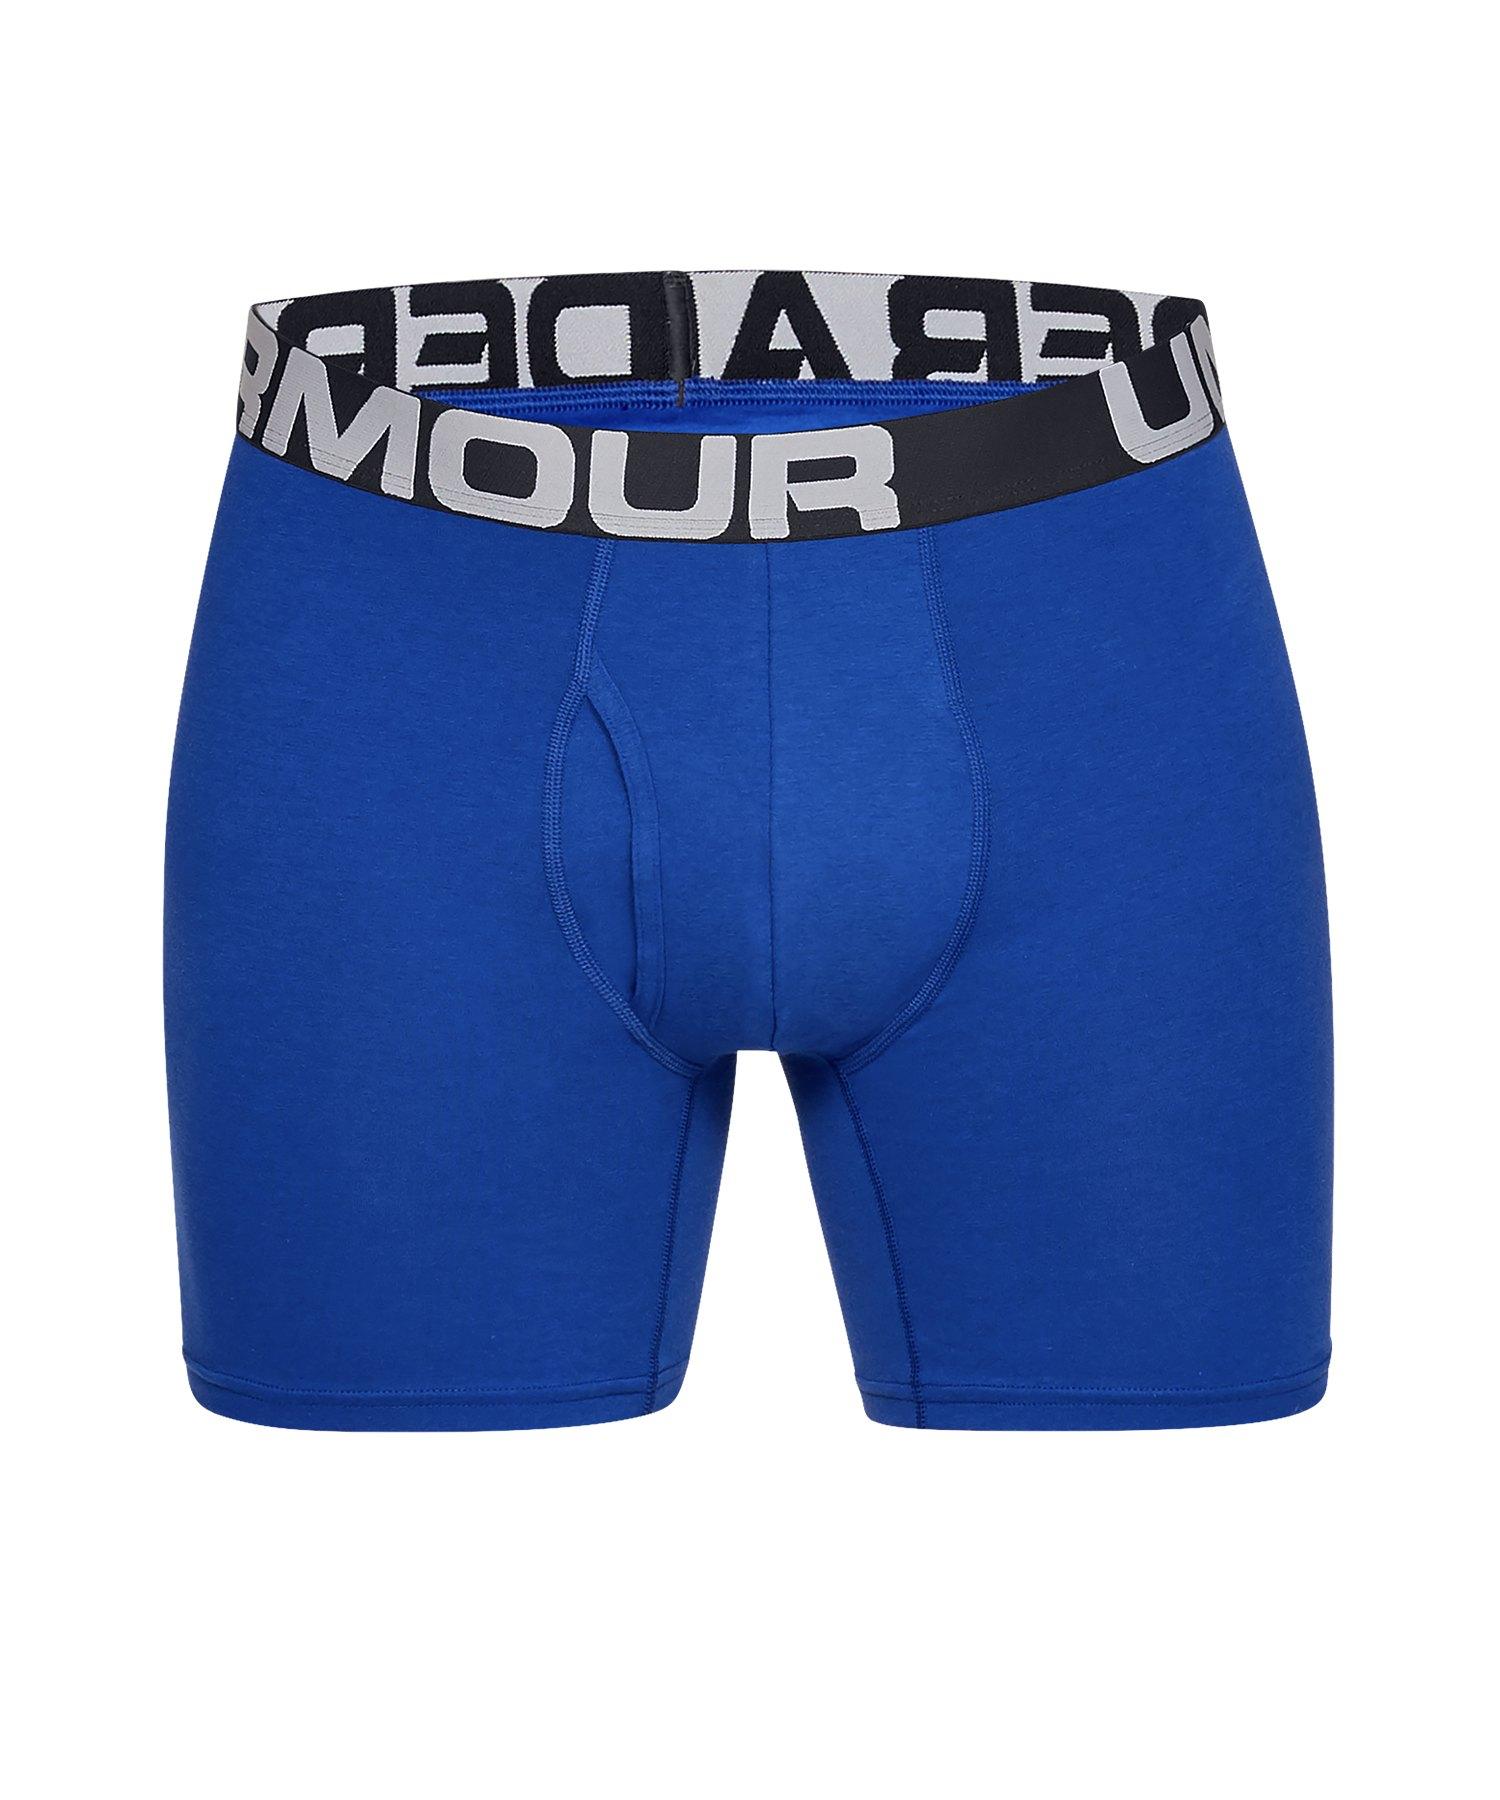 Under Armour Charged Boxerjock Short 3er Pack F400 - blau